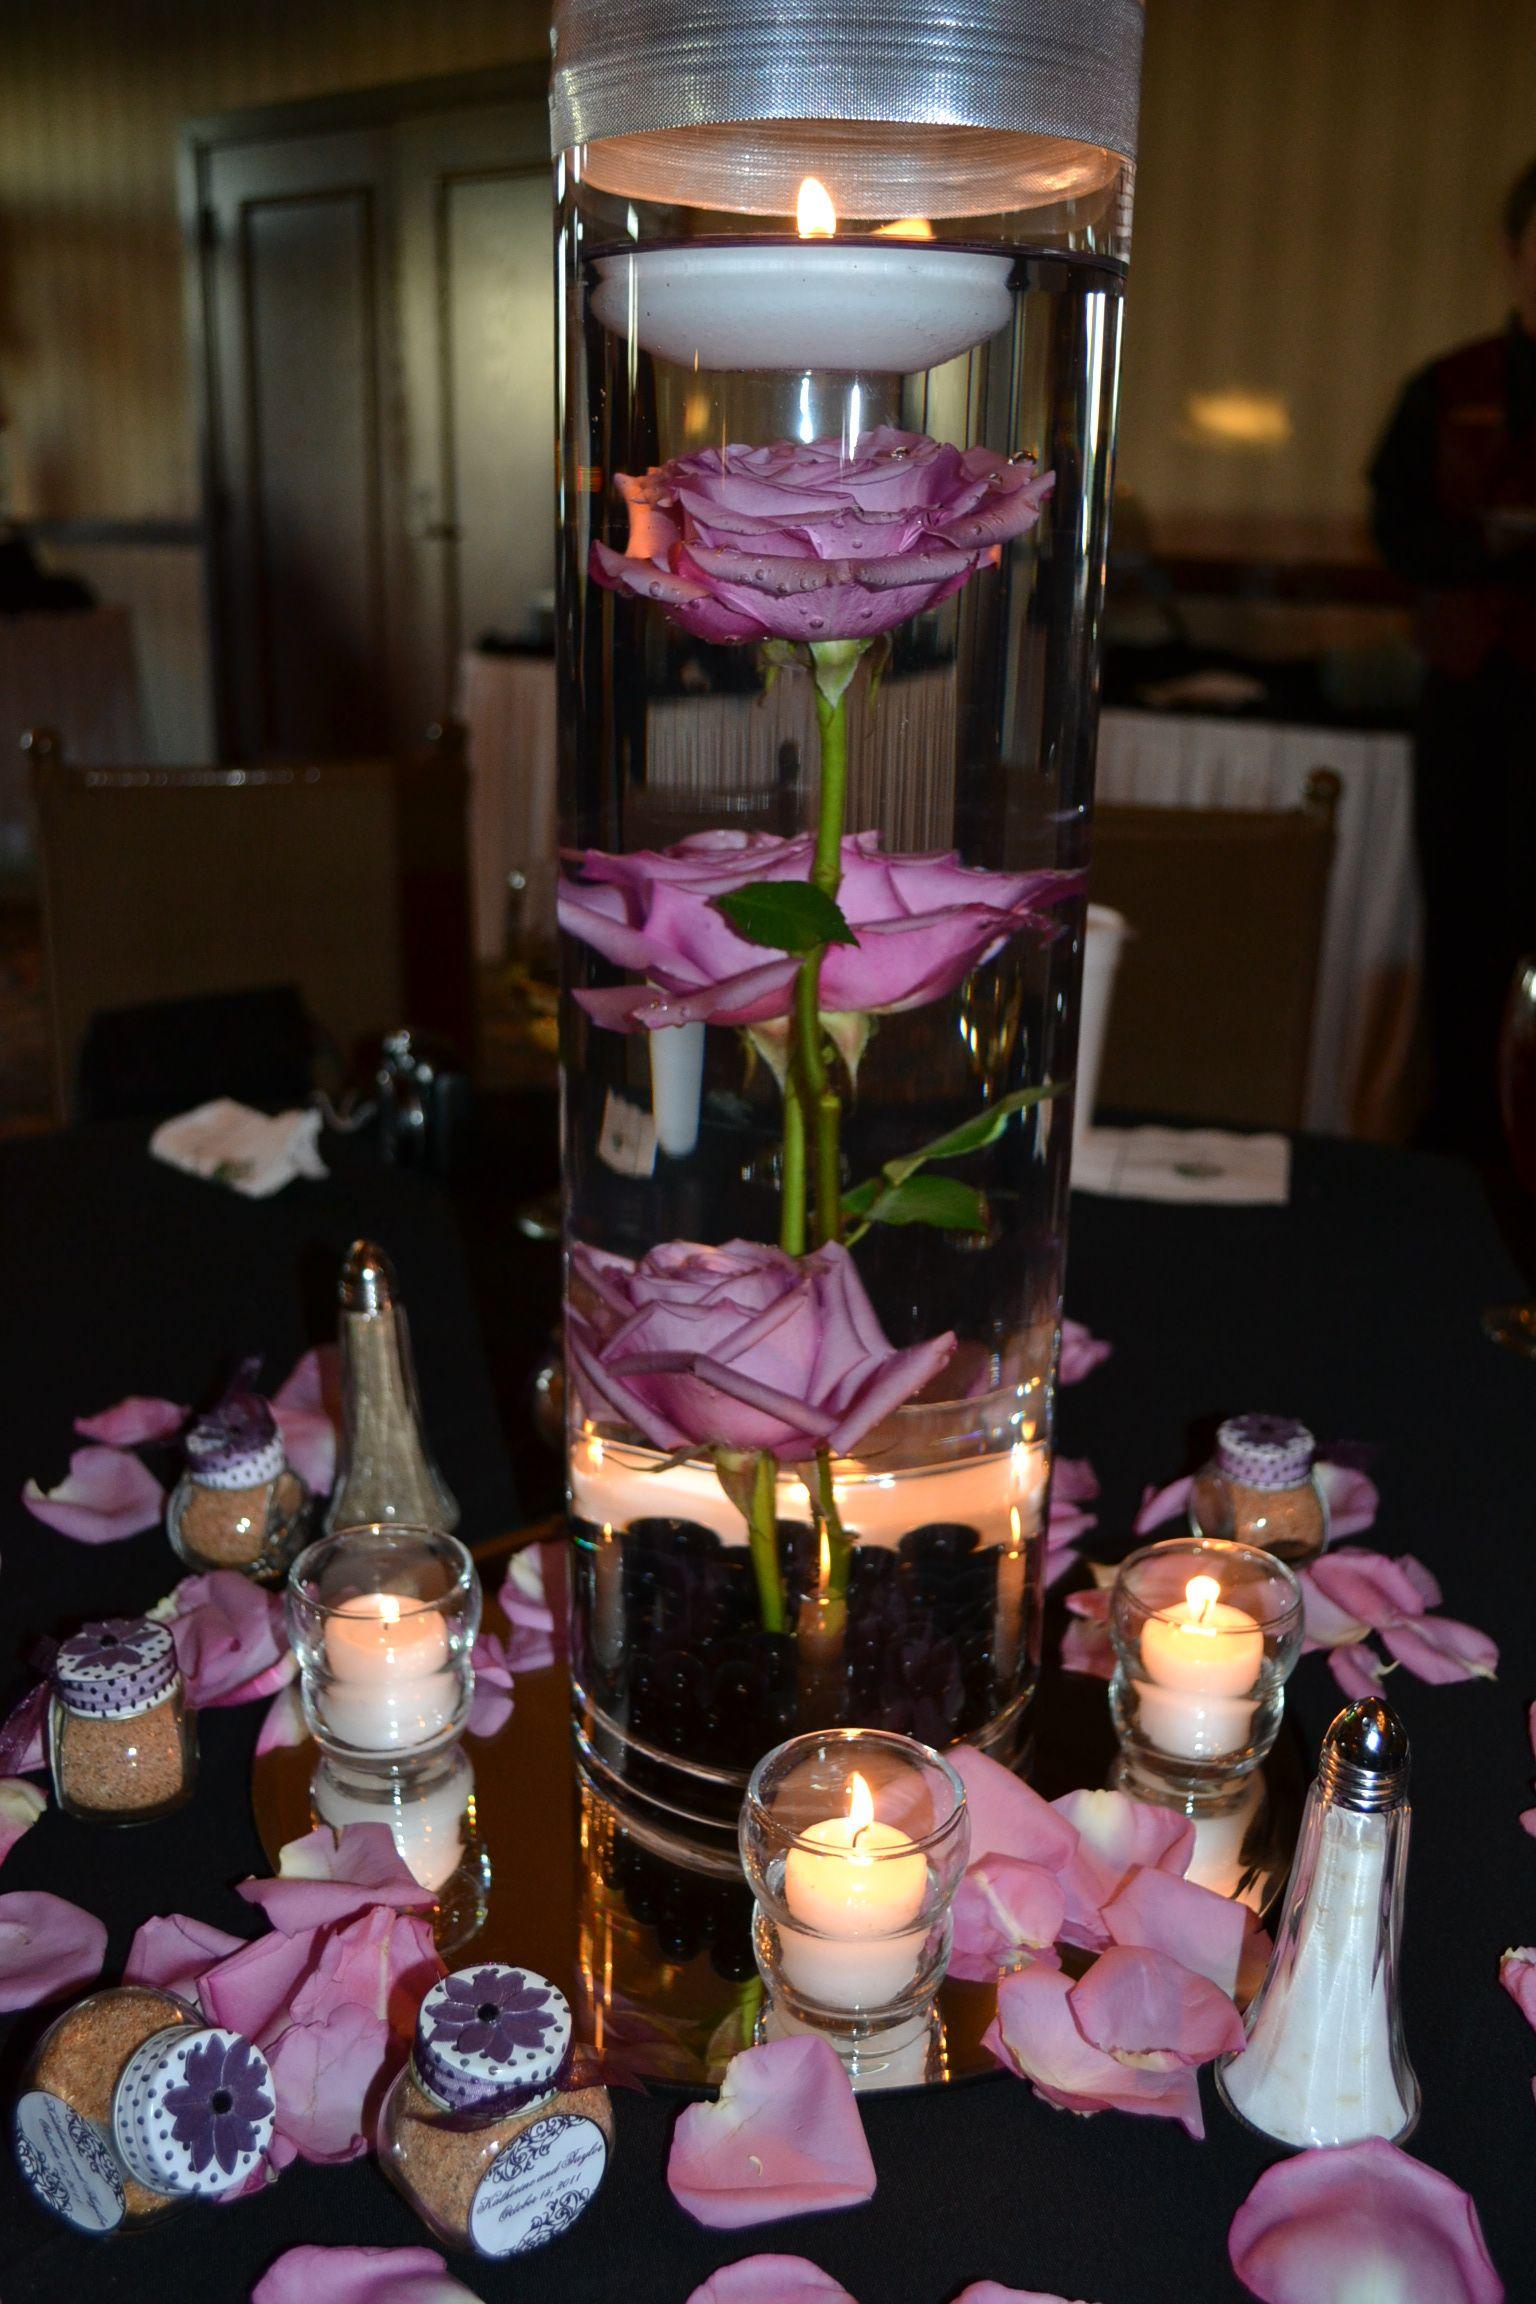 Wedding decoration ideas purple  more centerpieces  centerpieces  Pinterest  Centerpieces